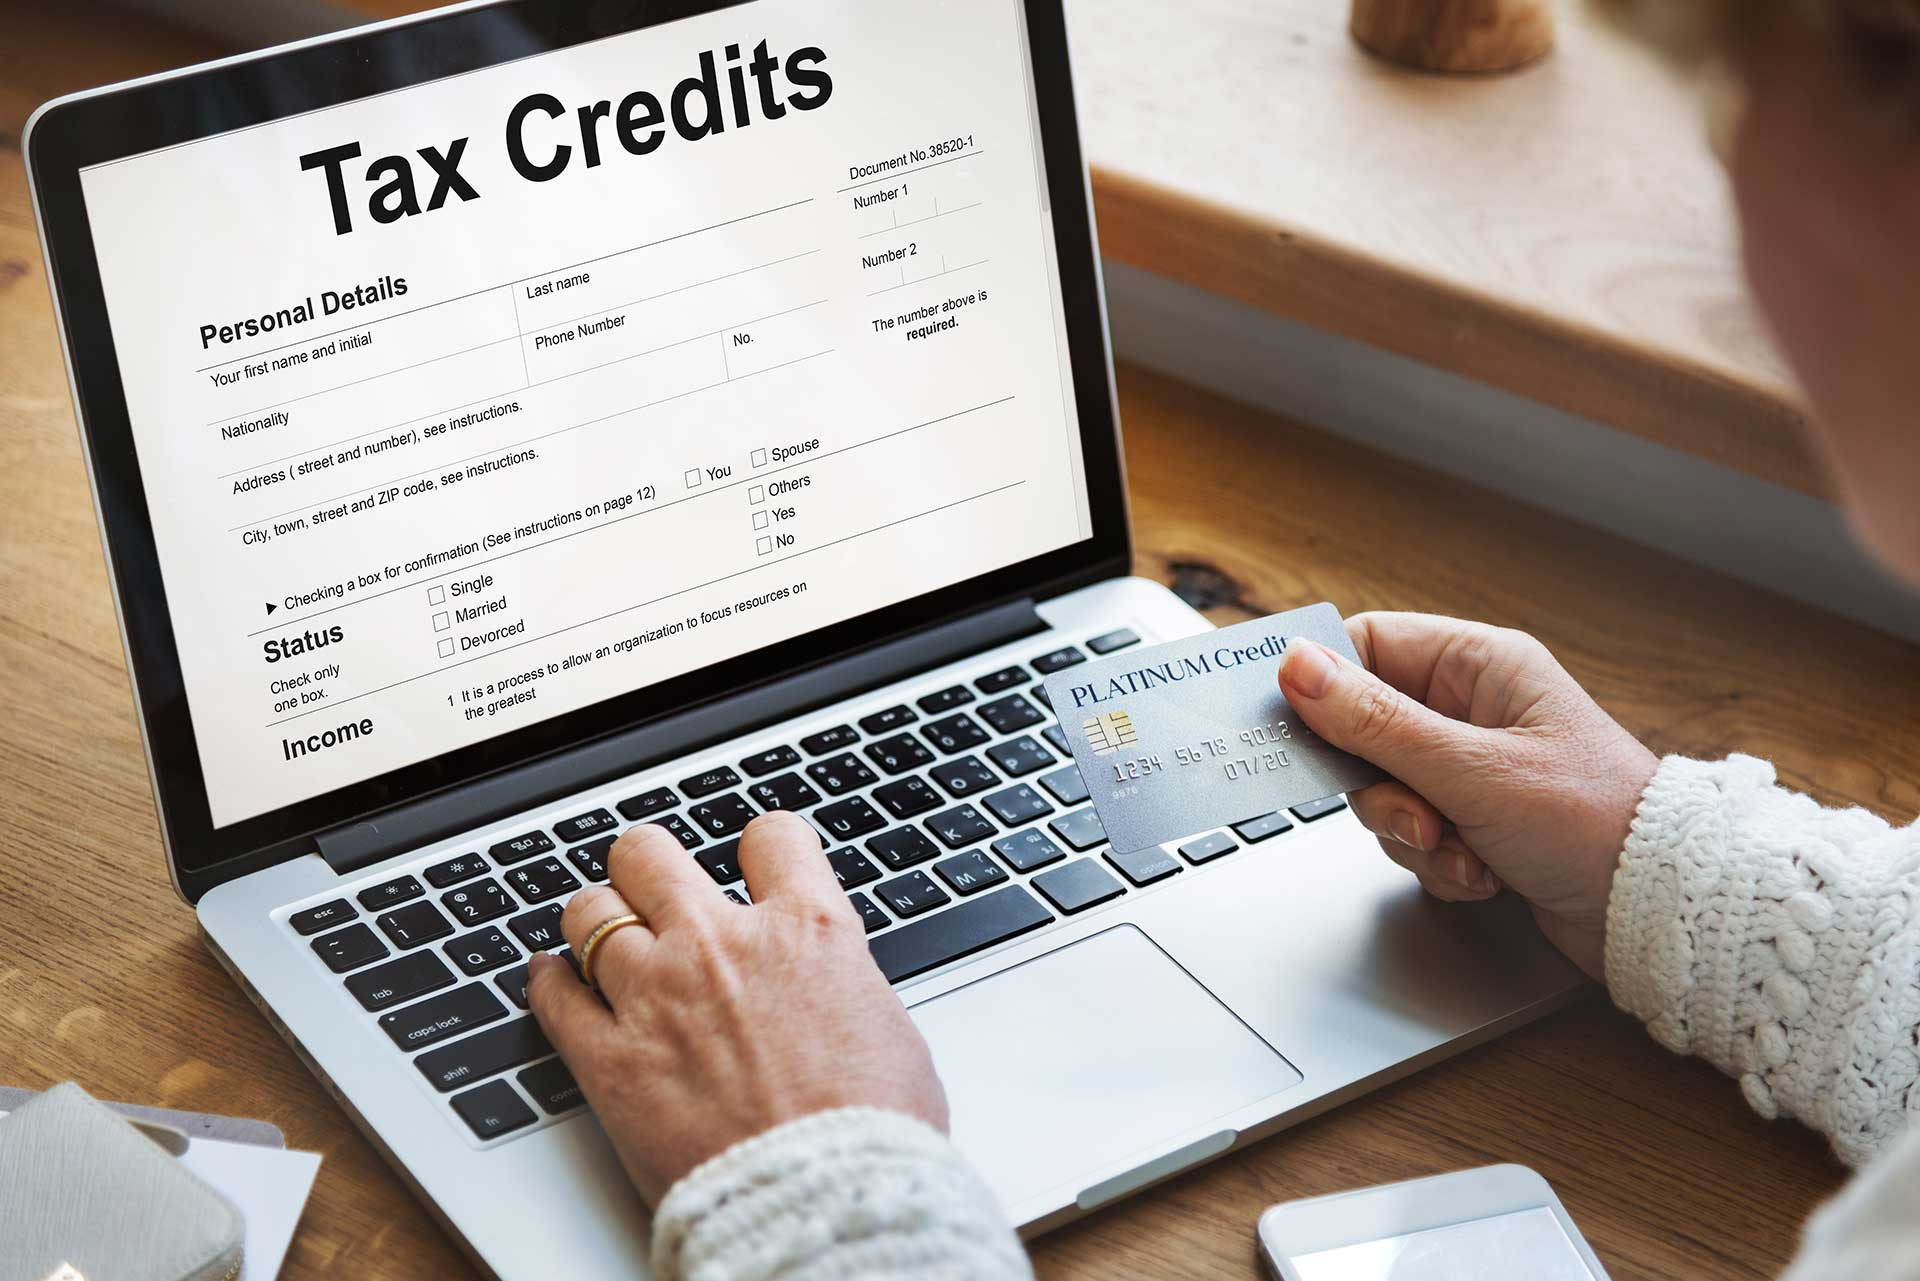 http://digitus-accountancy.com/wp-content/uploads/2021/06/tax-credits.jpg